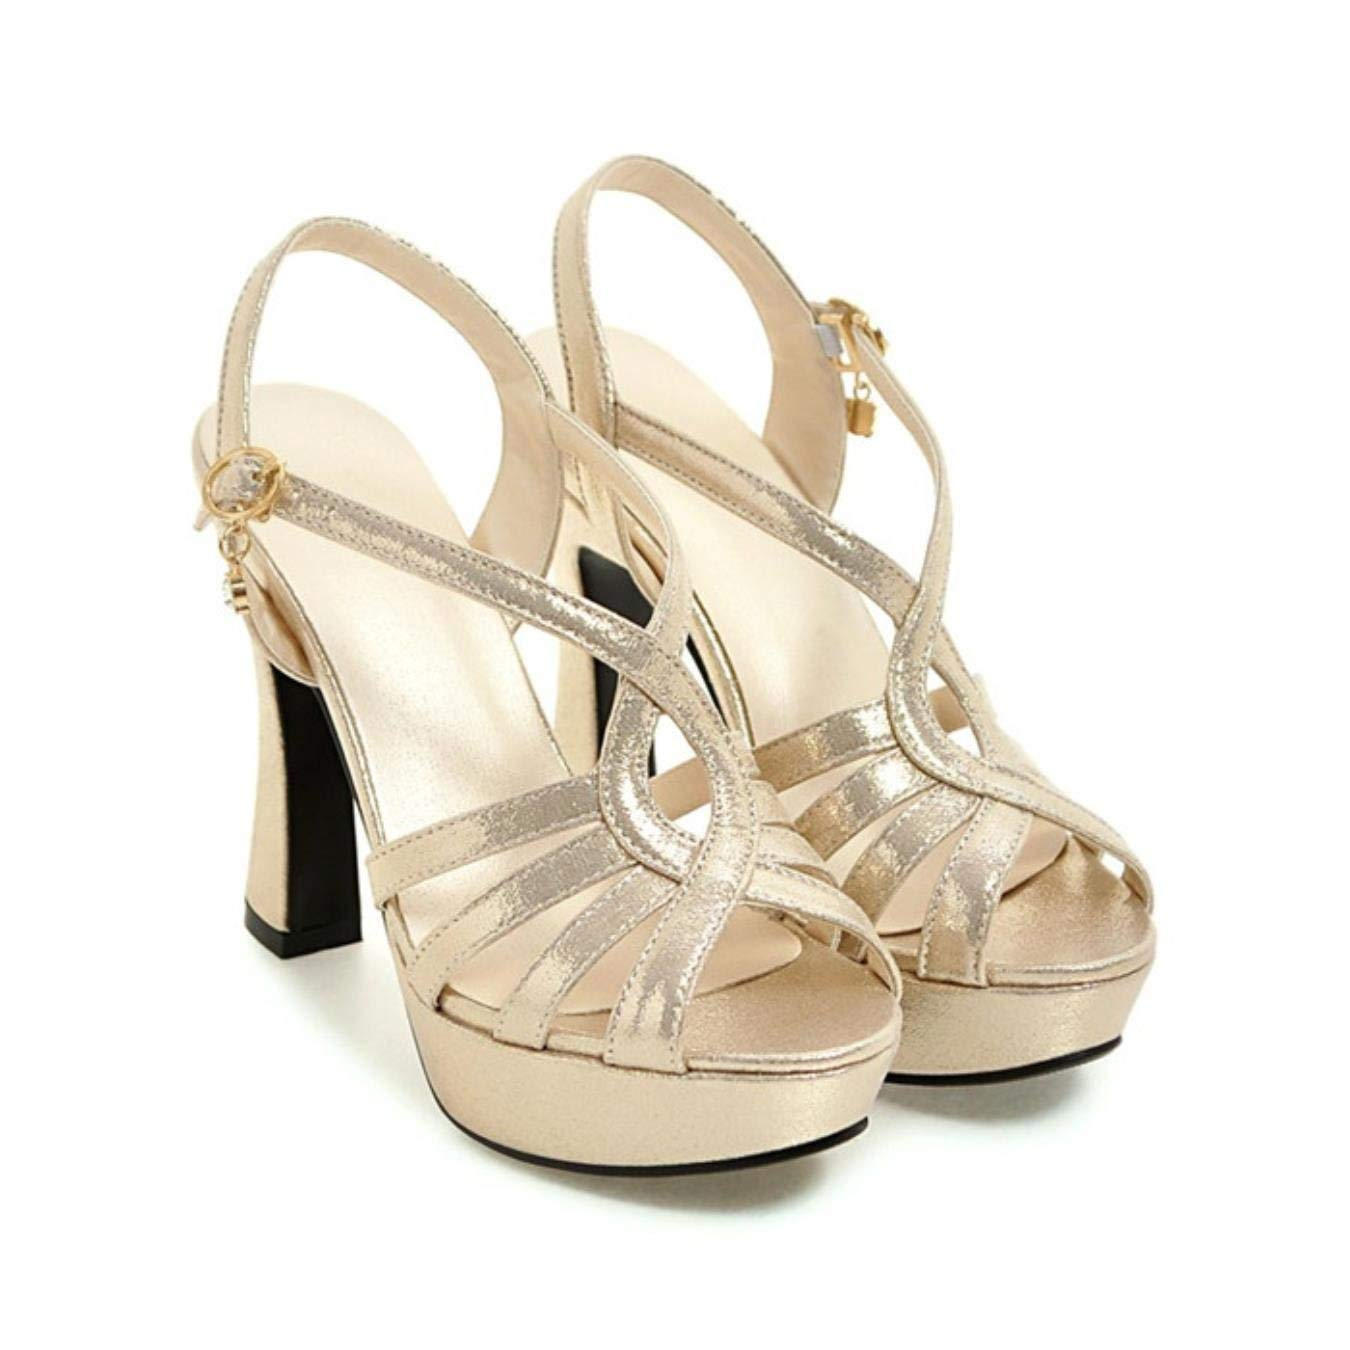 de7b90a5adaf Get Quotations · Women Sandals Platform High Heels Sandals Gladiator Shoes  Summer Sexy Silver Party Wedding Shoes